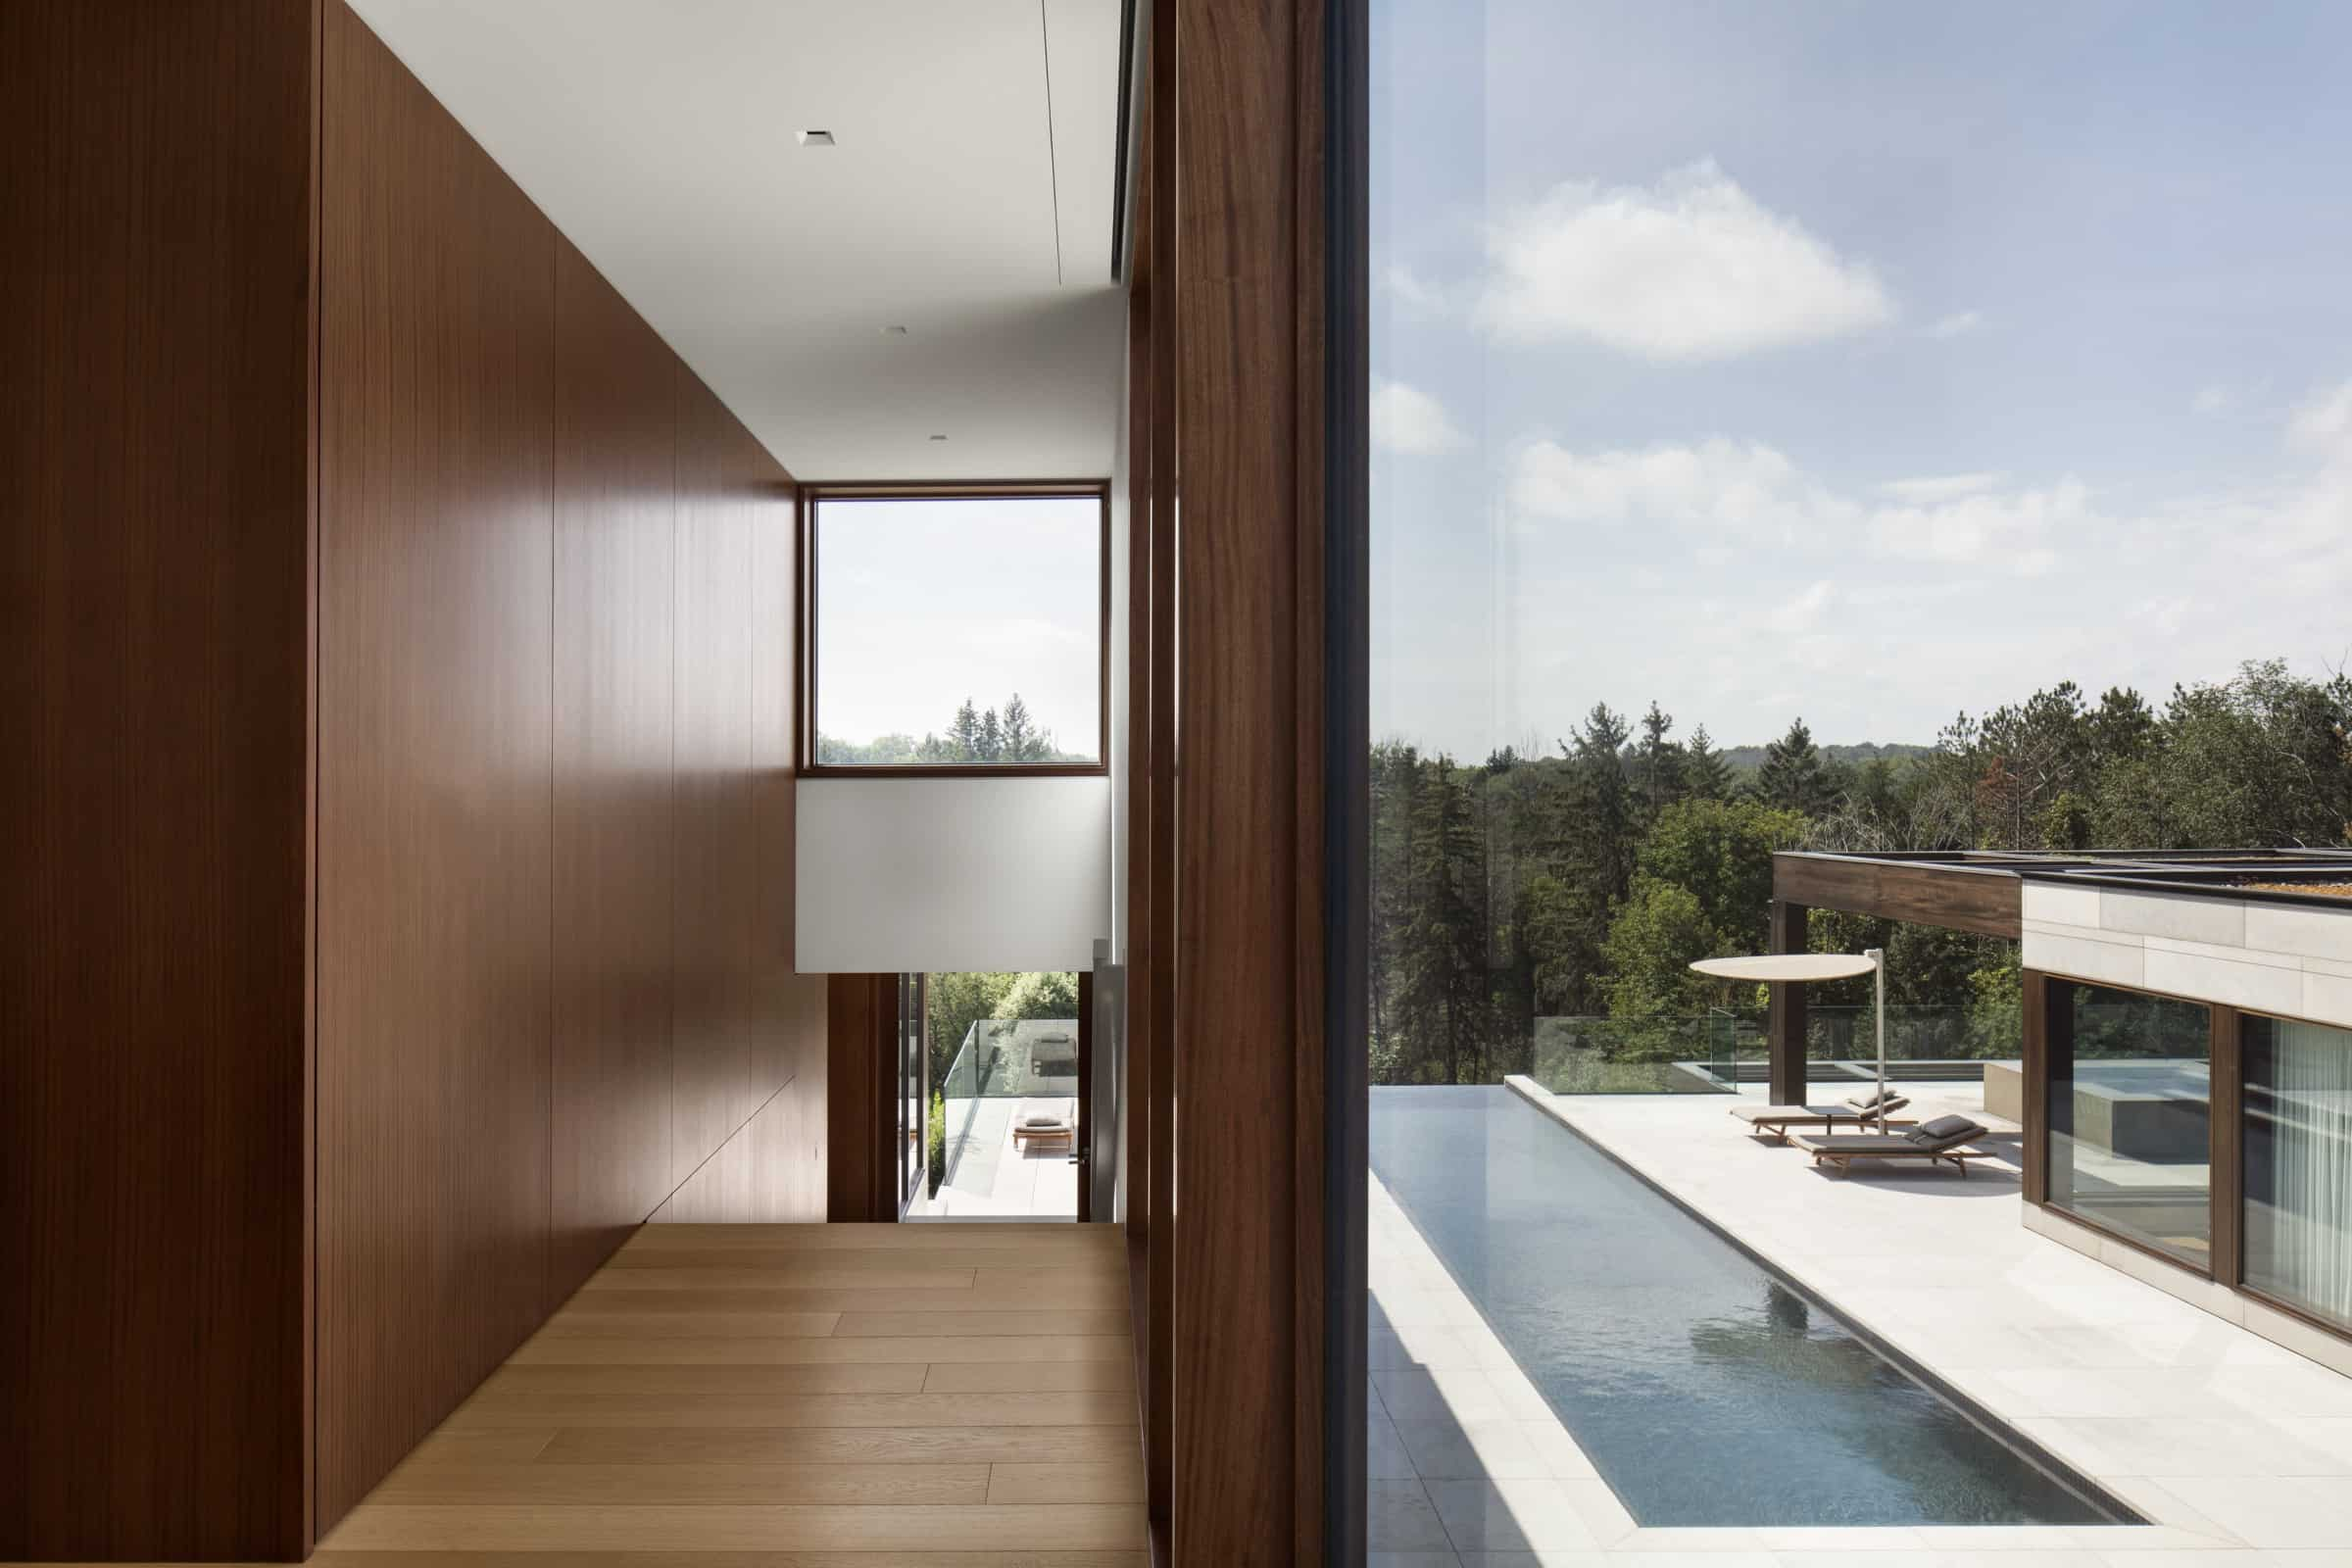 Studio Munge_Private Residence_23_Adrien Williams_web